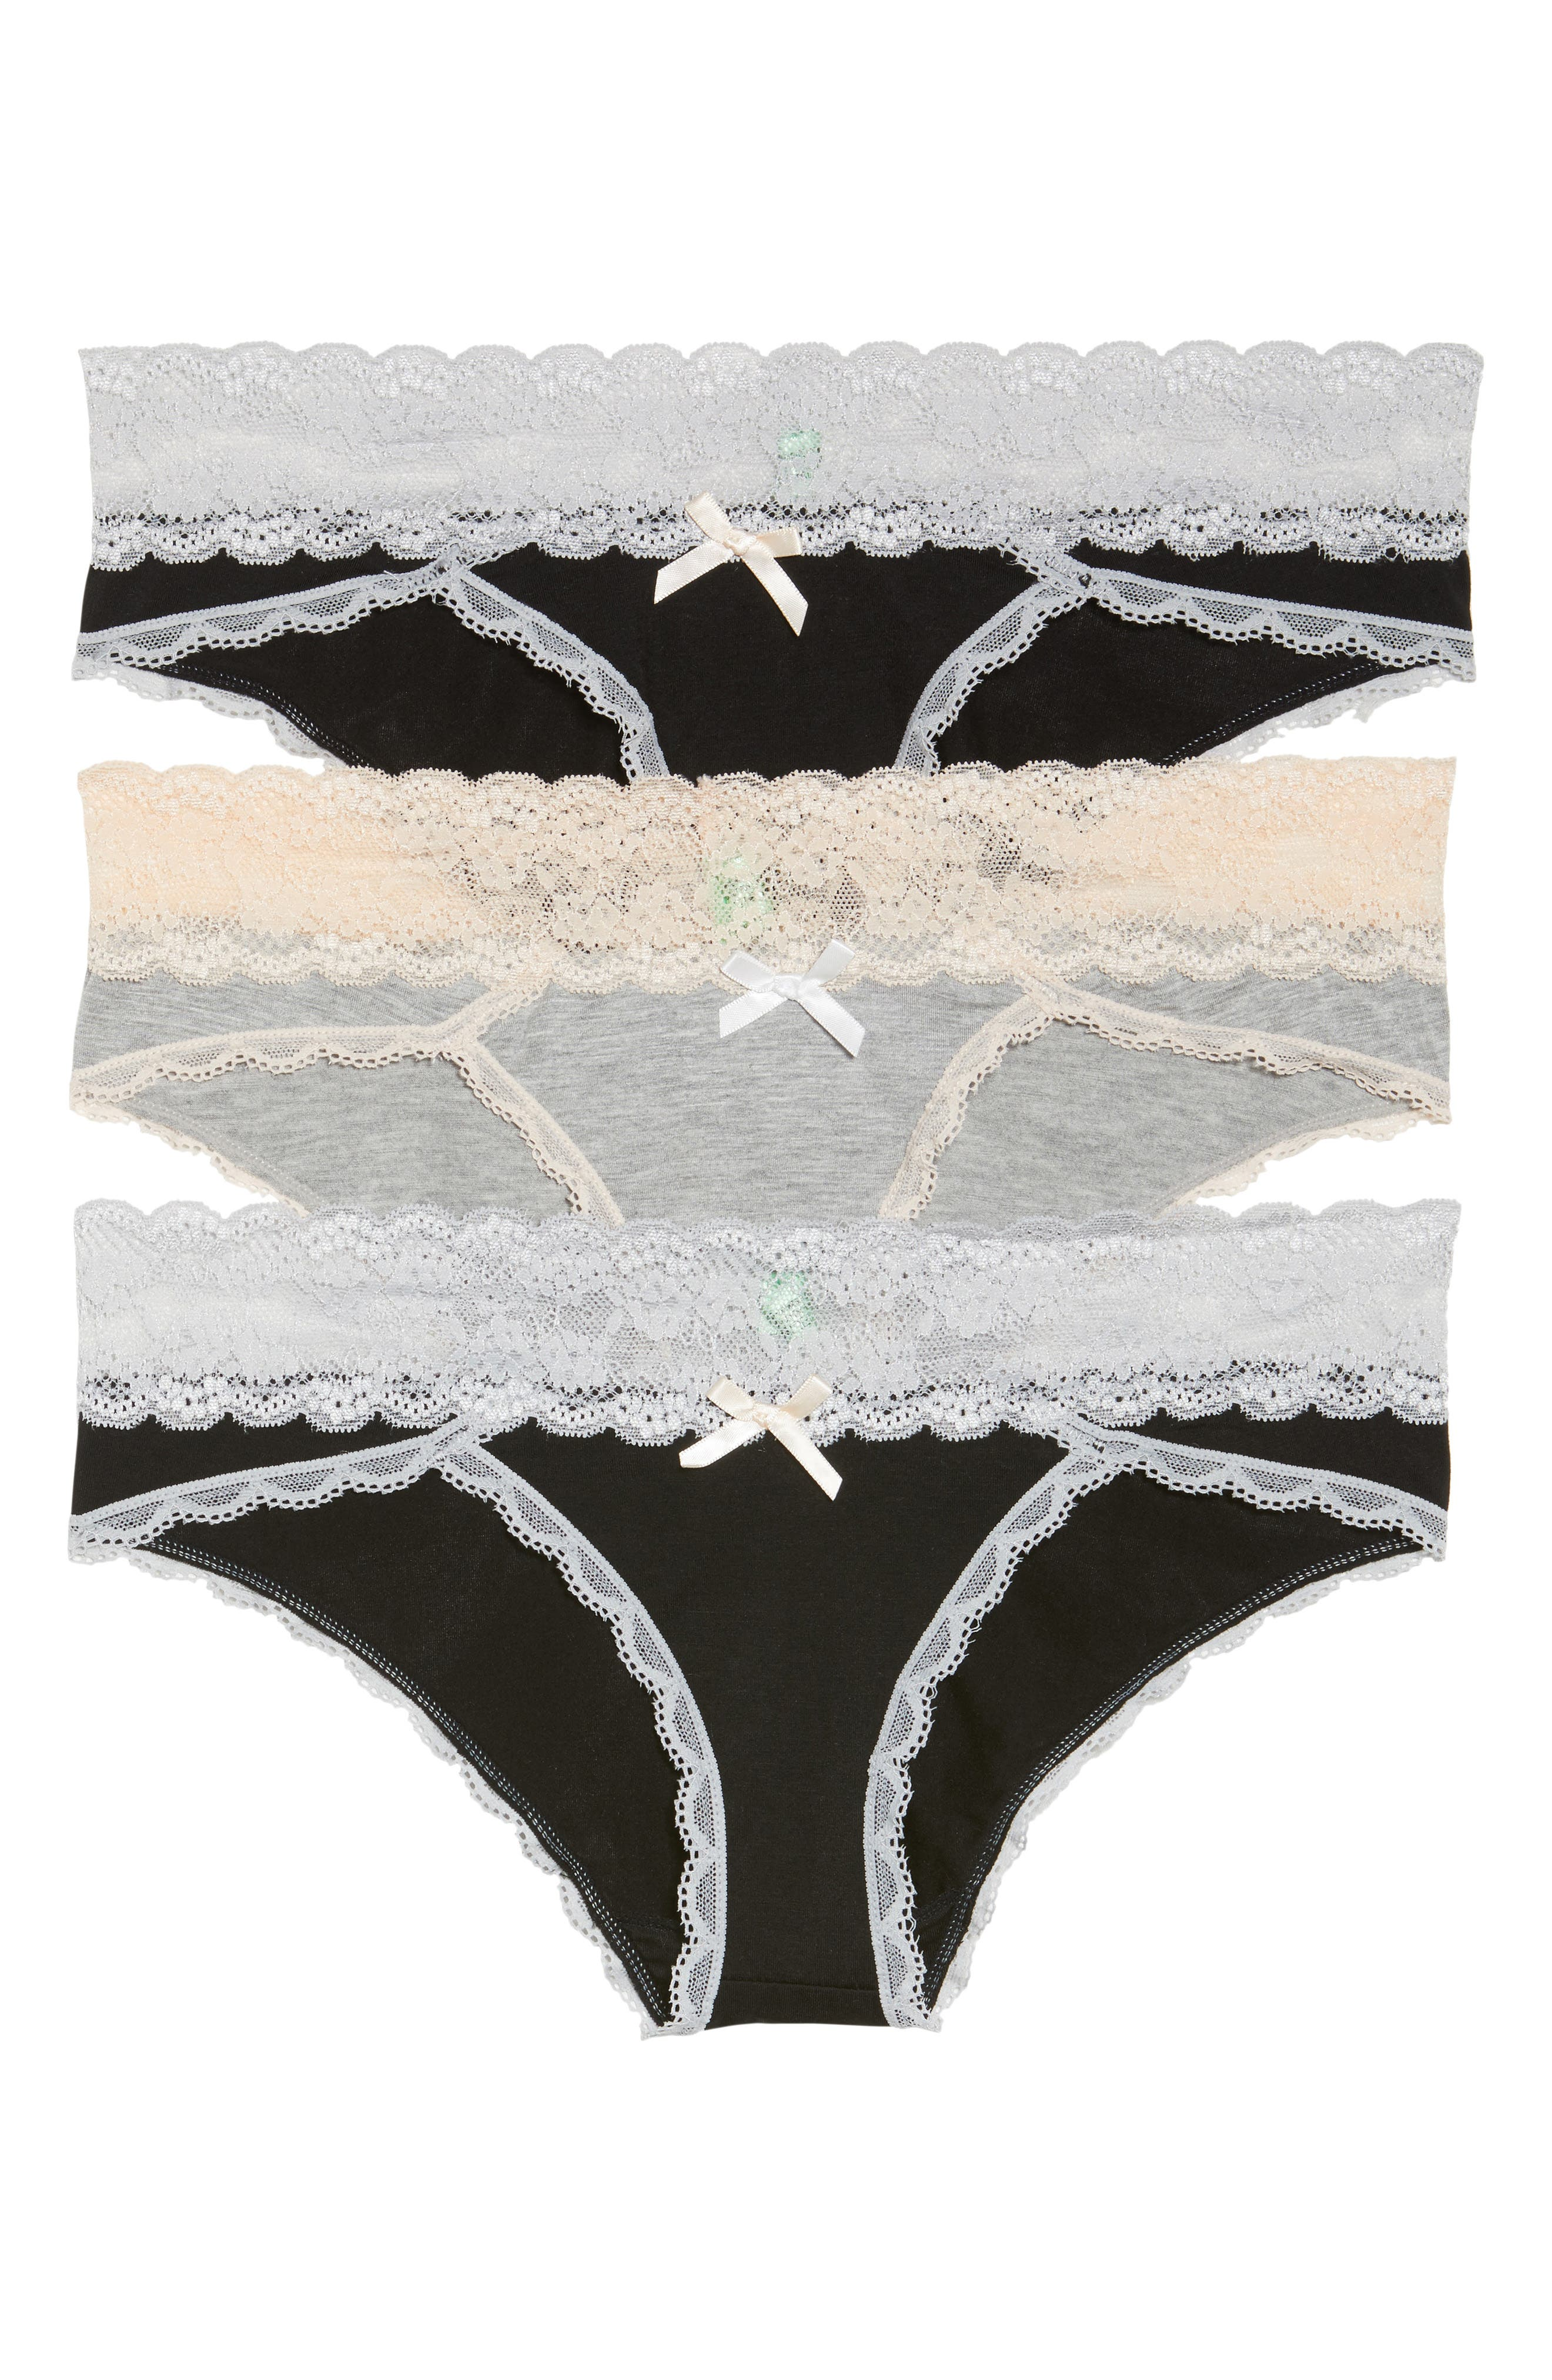 3-Pack Hipster Panties,                             Main thumbnail 1, color,                             Black/ Heather Grey/ Black